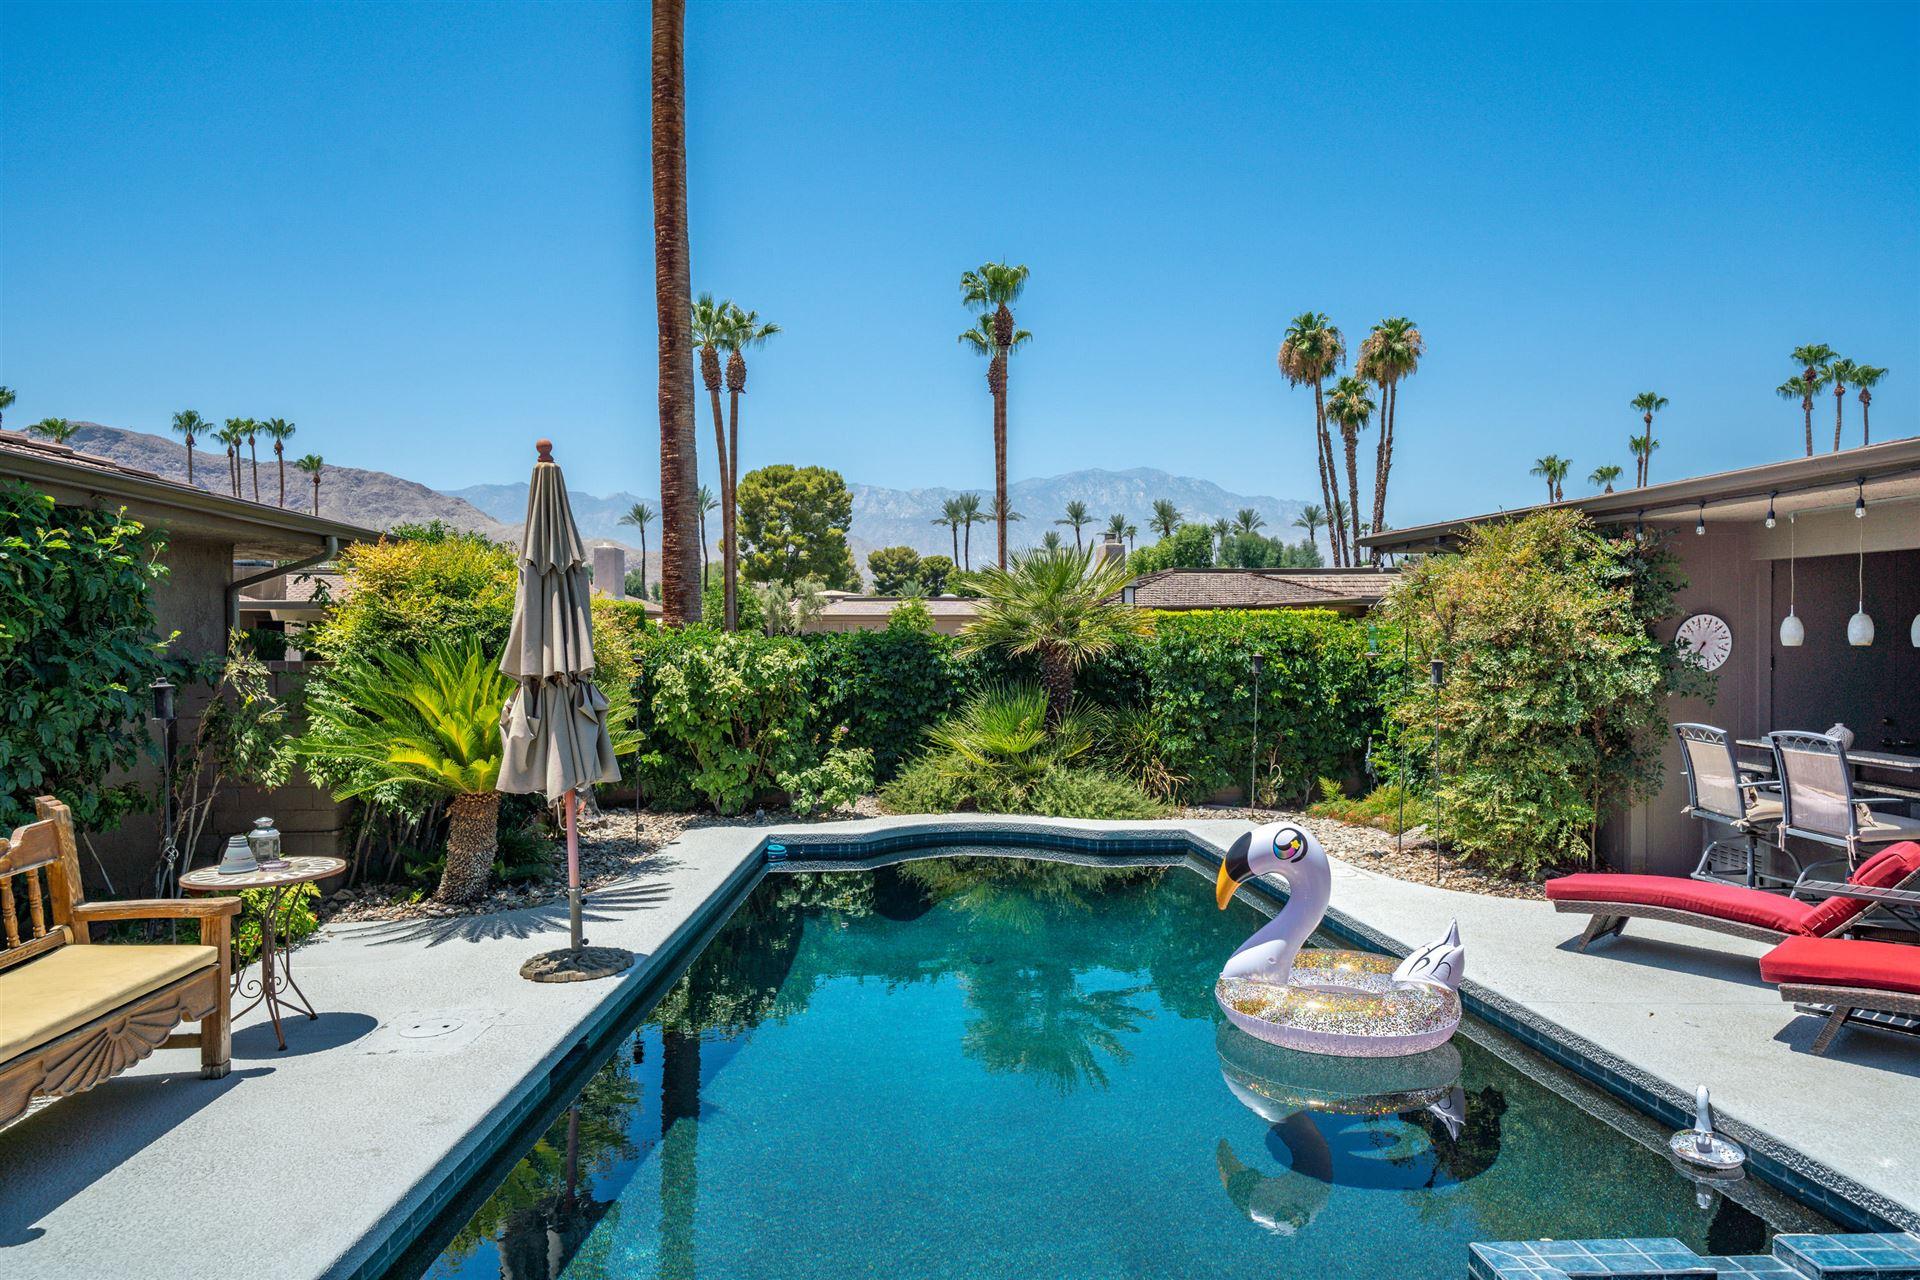 12 Dartmouth Drive, Rancho Mirage, CA 92270 - MLS#: 219045448